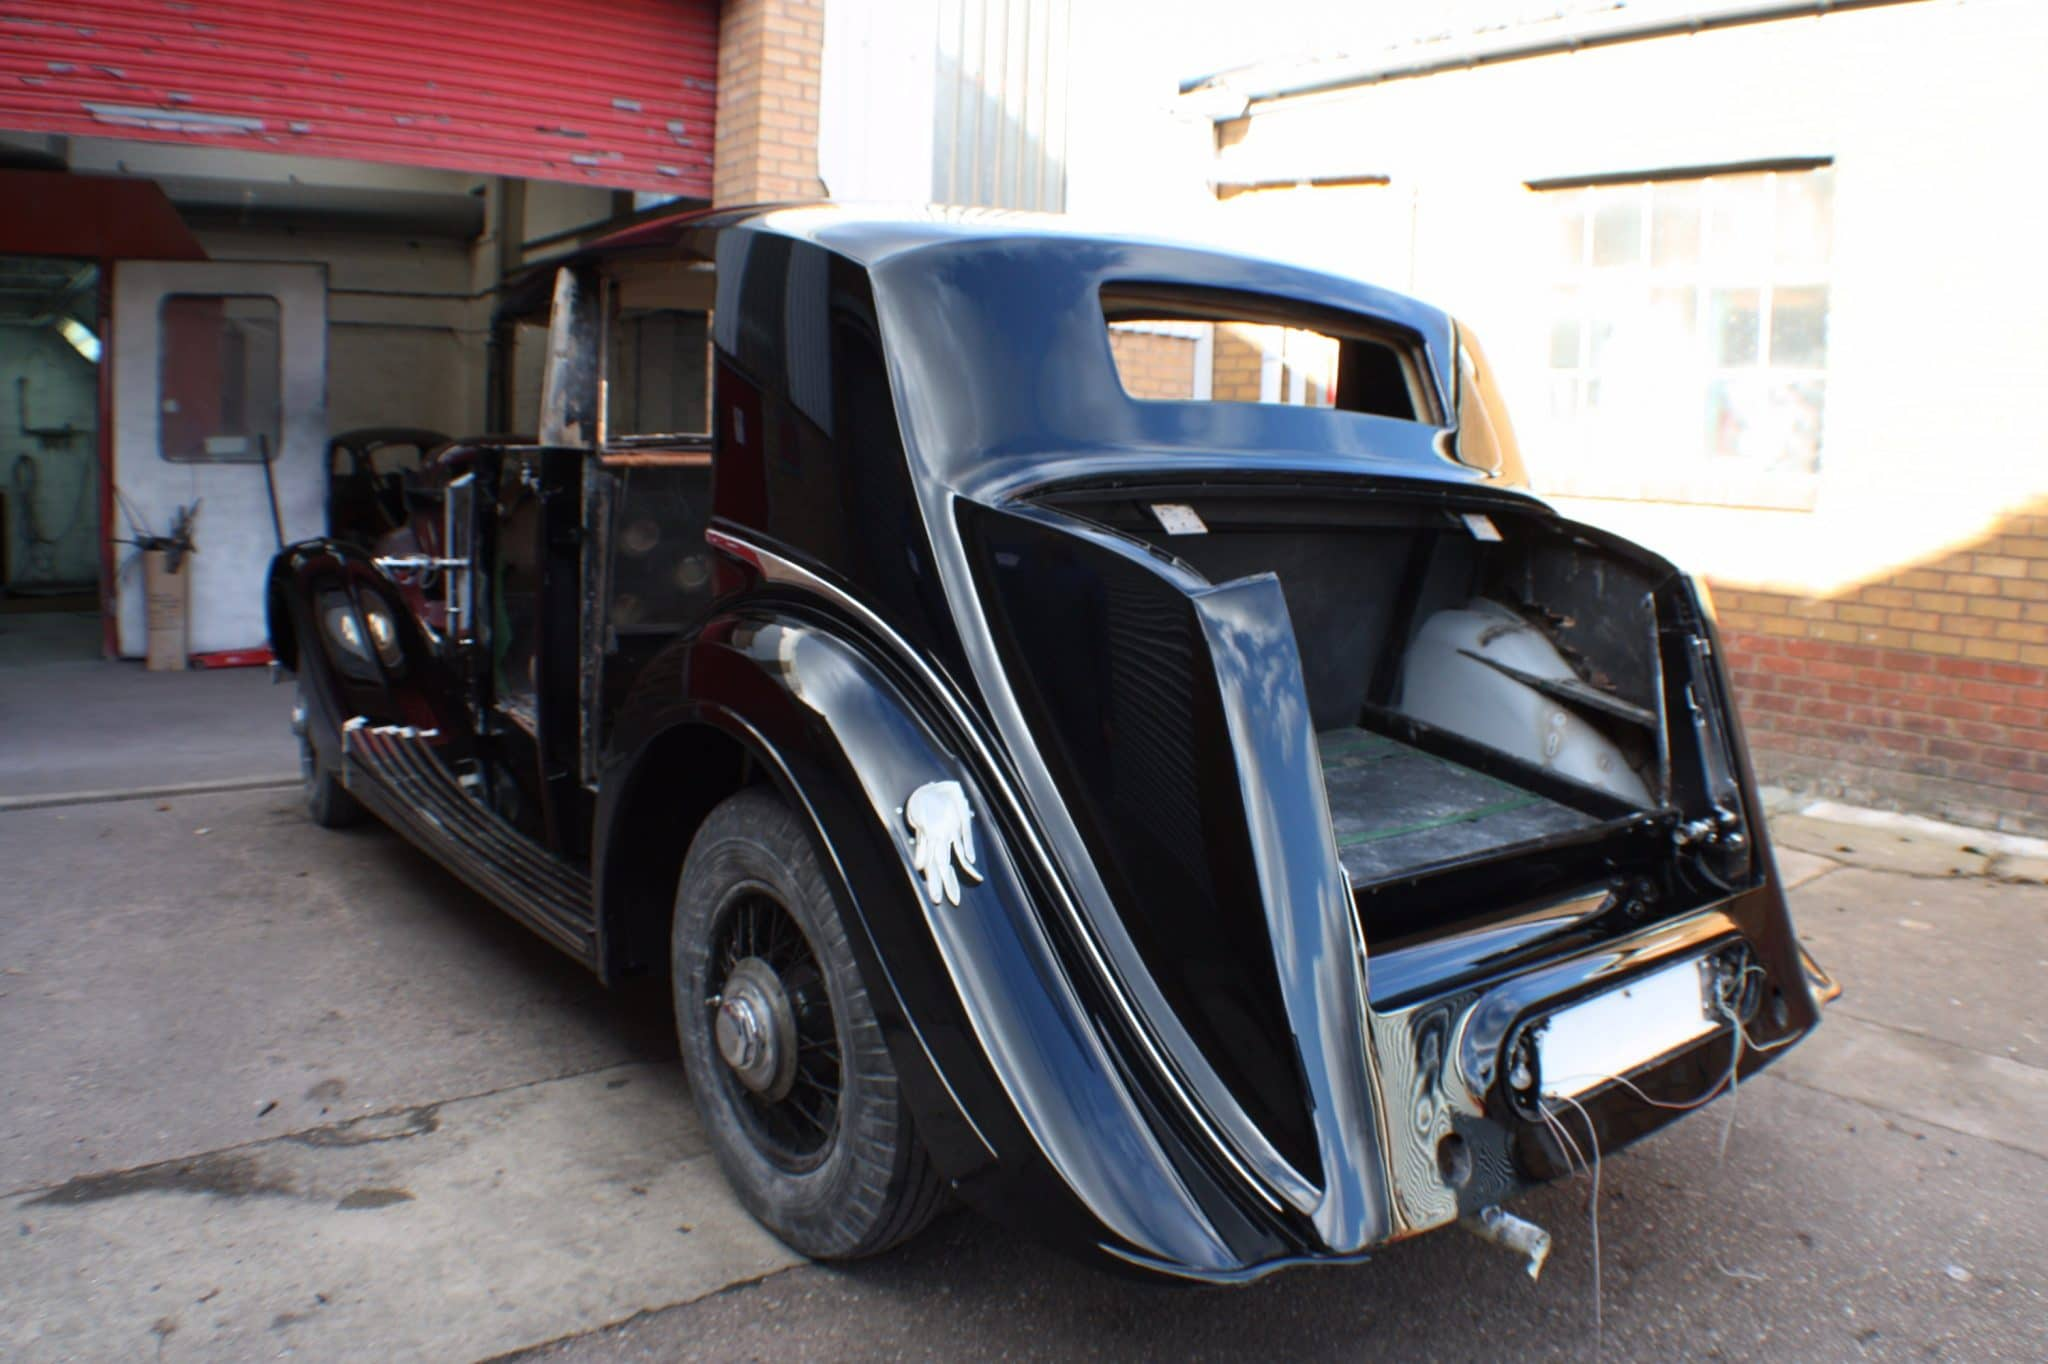 Rolls Royce restoration - back view